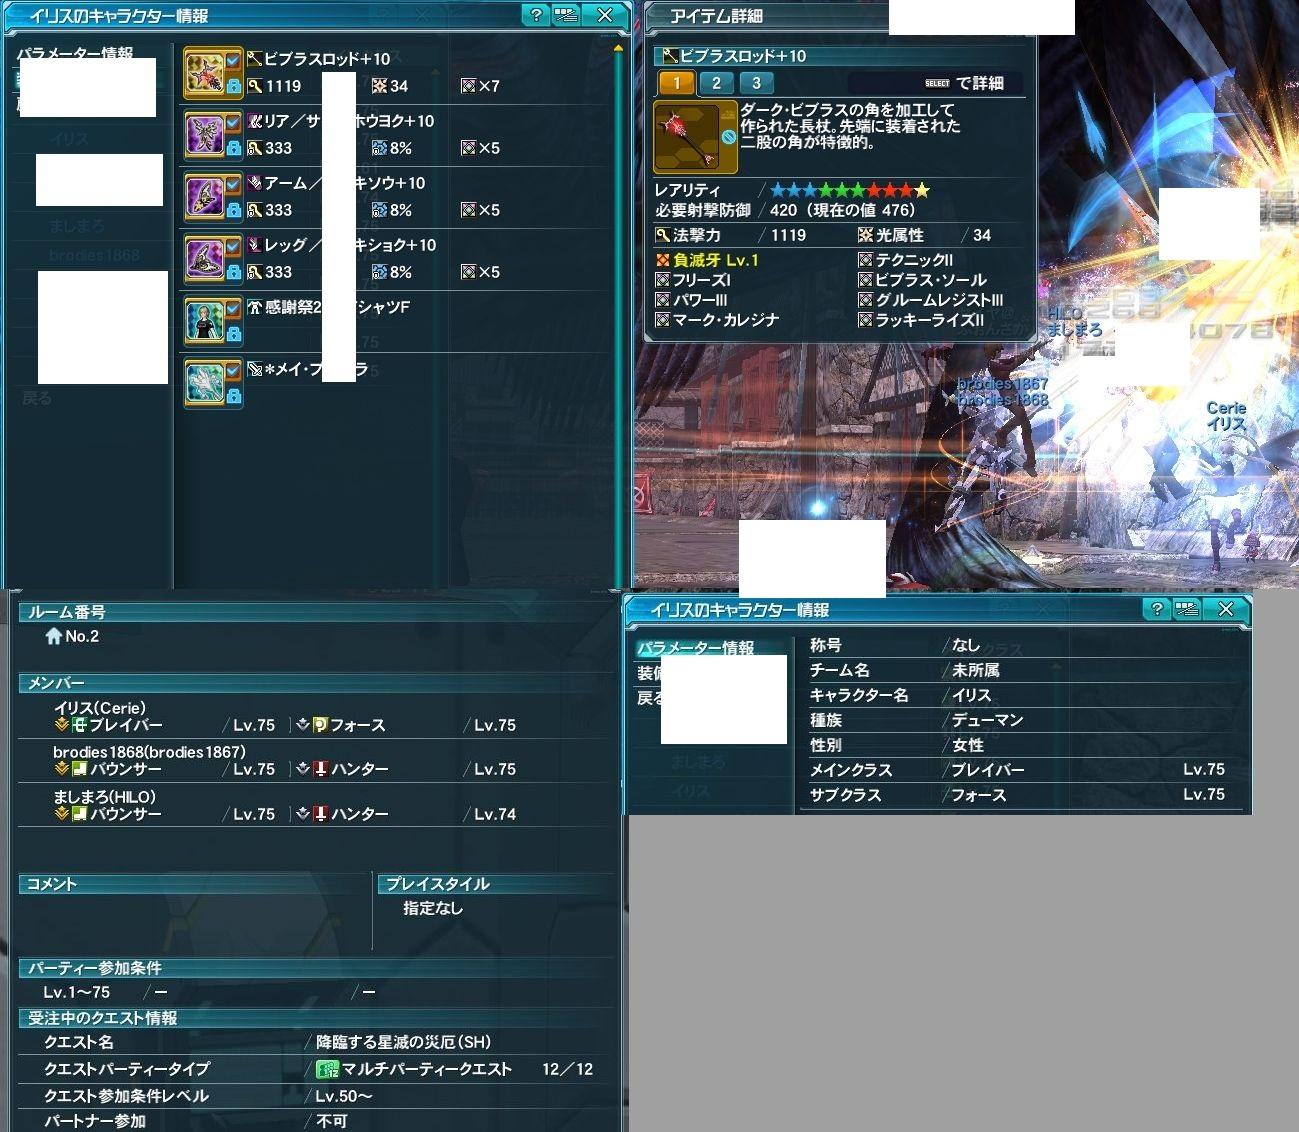 【PSO2】PHANTASY STAR ONLINE ship3 晒しスレ 34 [無断転載禁止]©2ch.net->画像>58枚